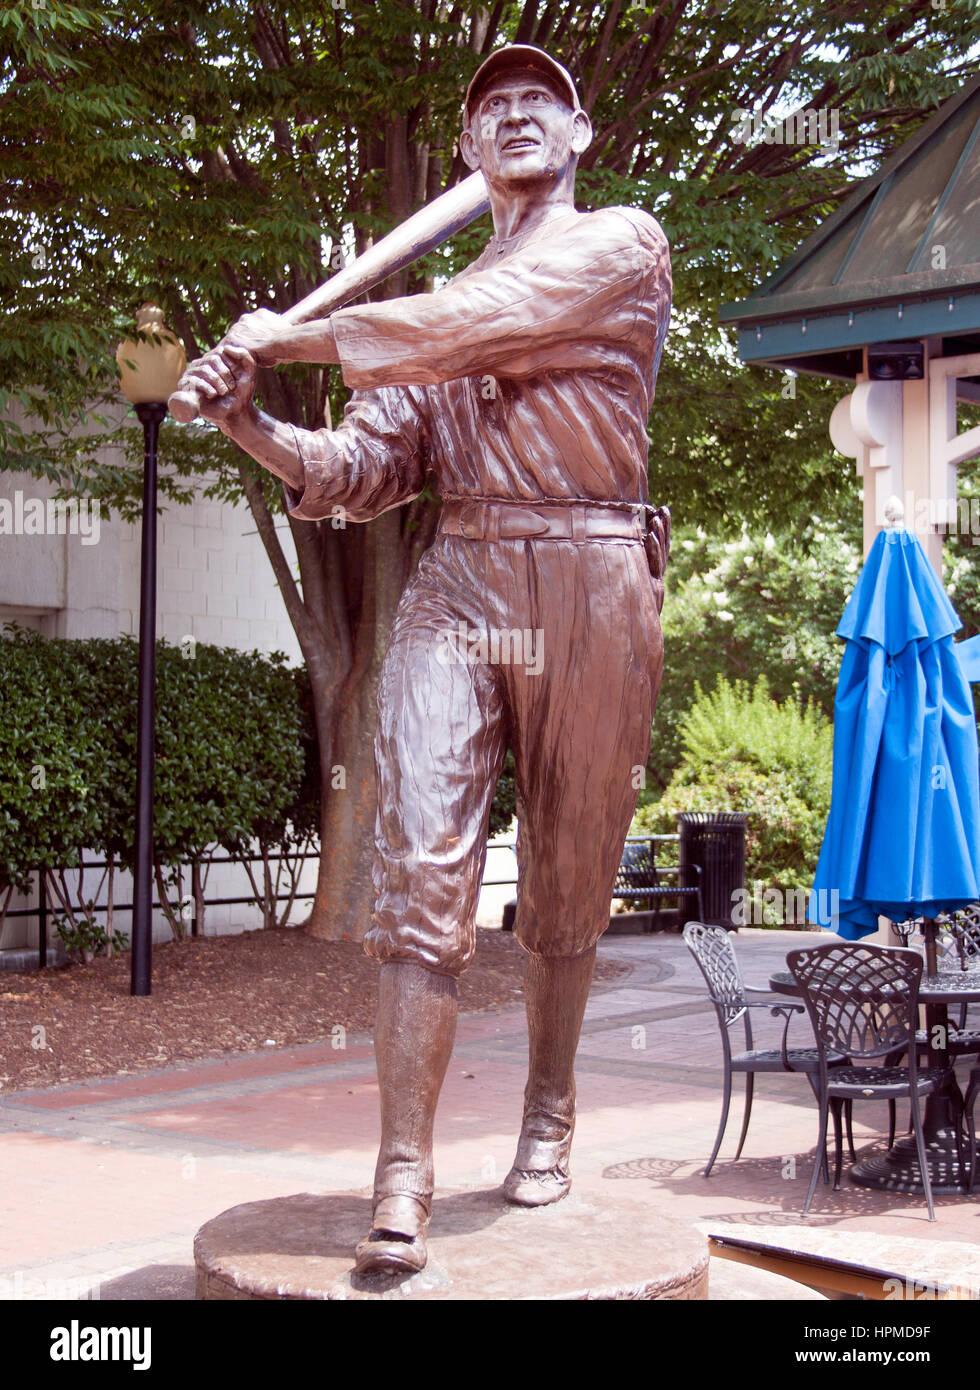 Shoeless Joe Jackson Statue in Greenville South Carolina - Stock Image